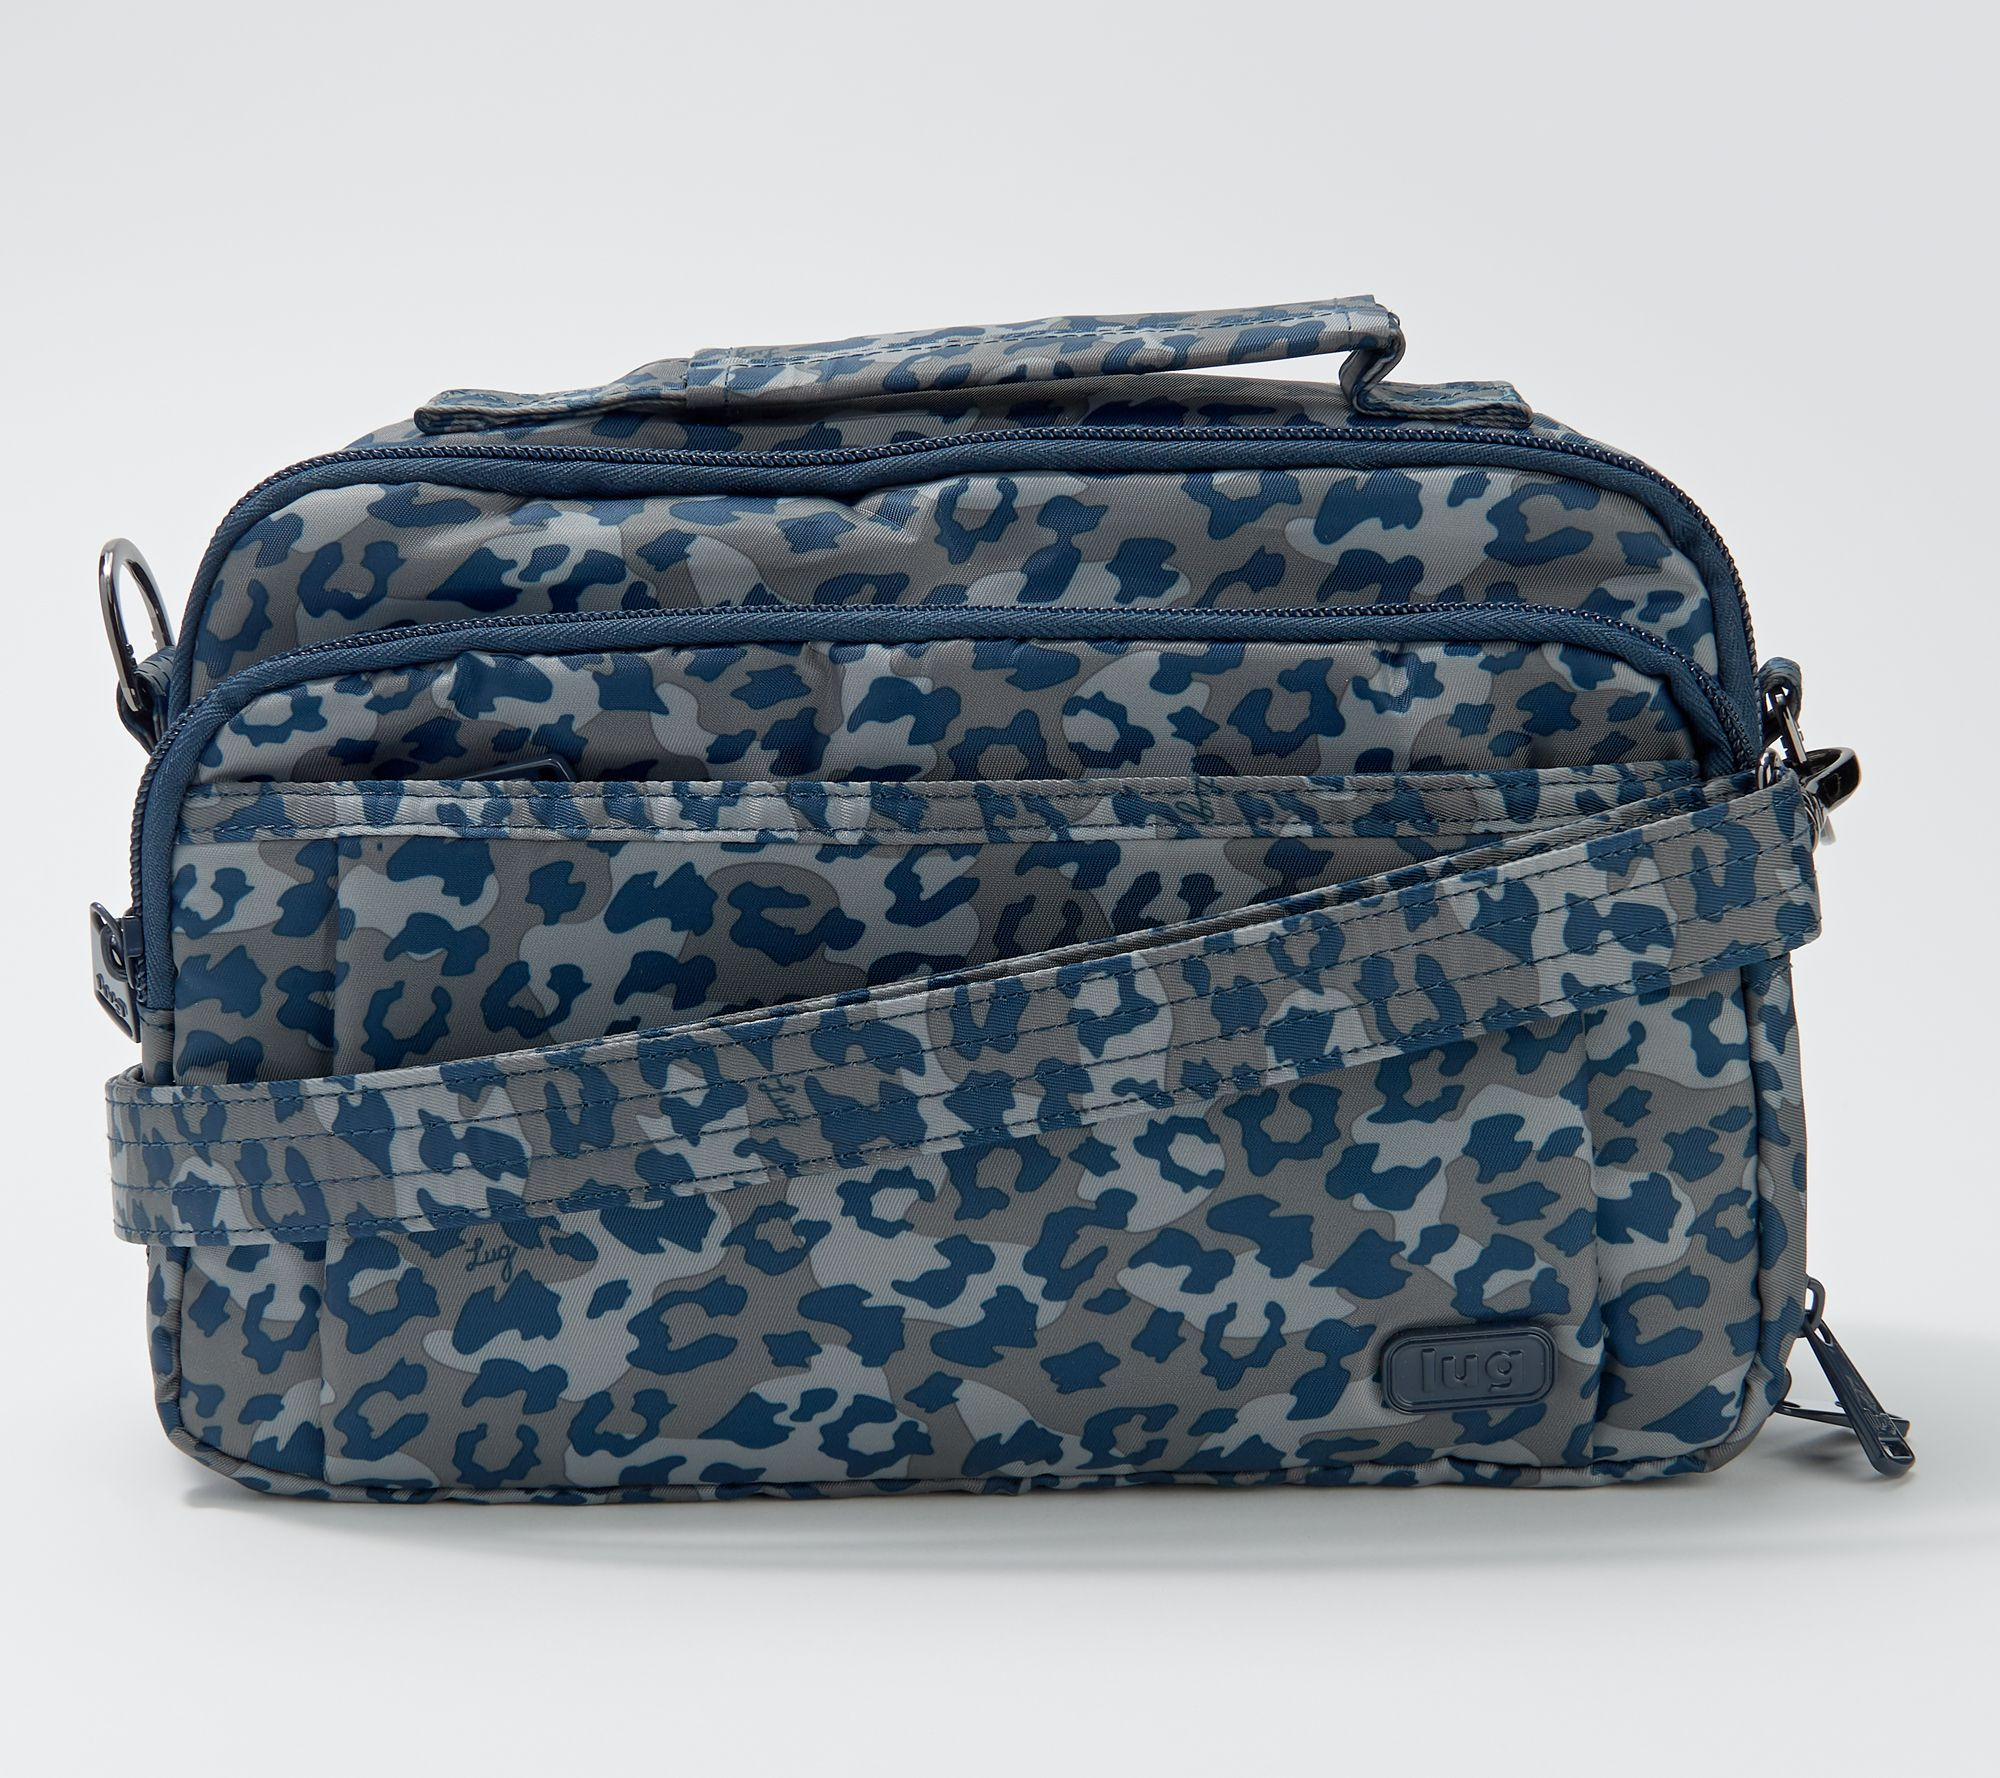 dc2f9f9b0 Lug Top Handle Crossbody Bag - Scoop - Page 1 — QVC.com